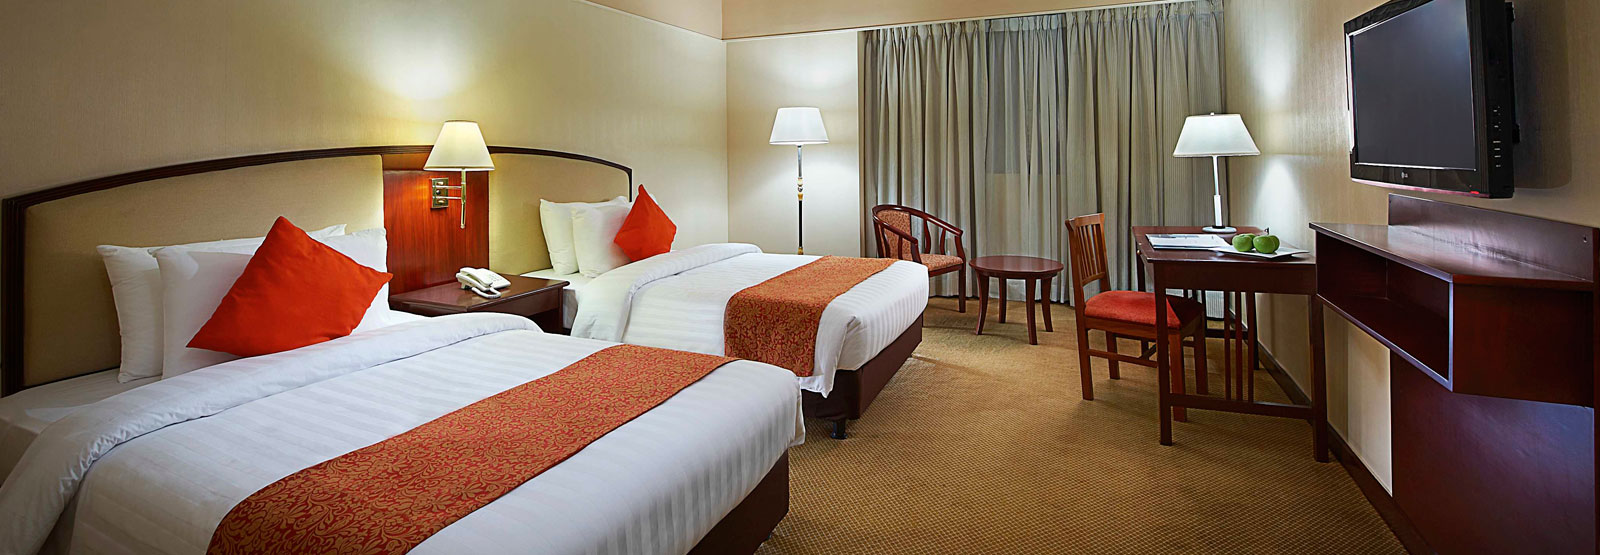 Hotel In Manila Philippines Rooms At Berjaya Hotel Makati